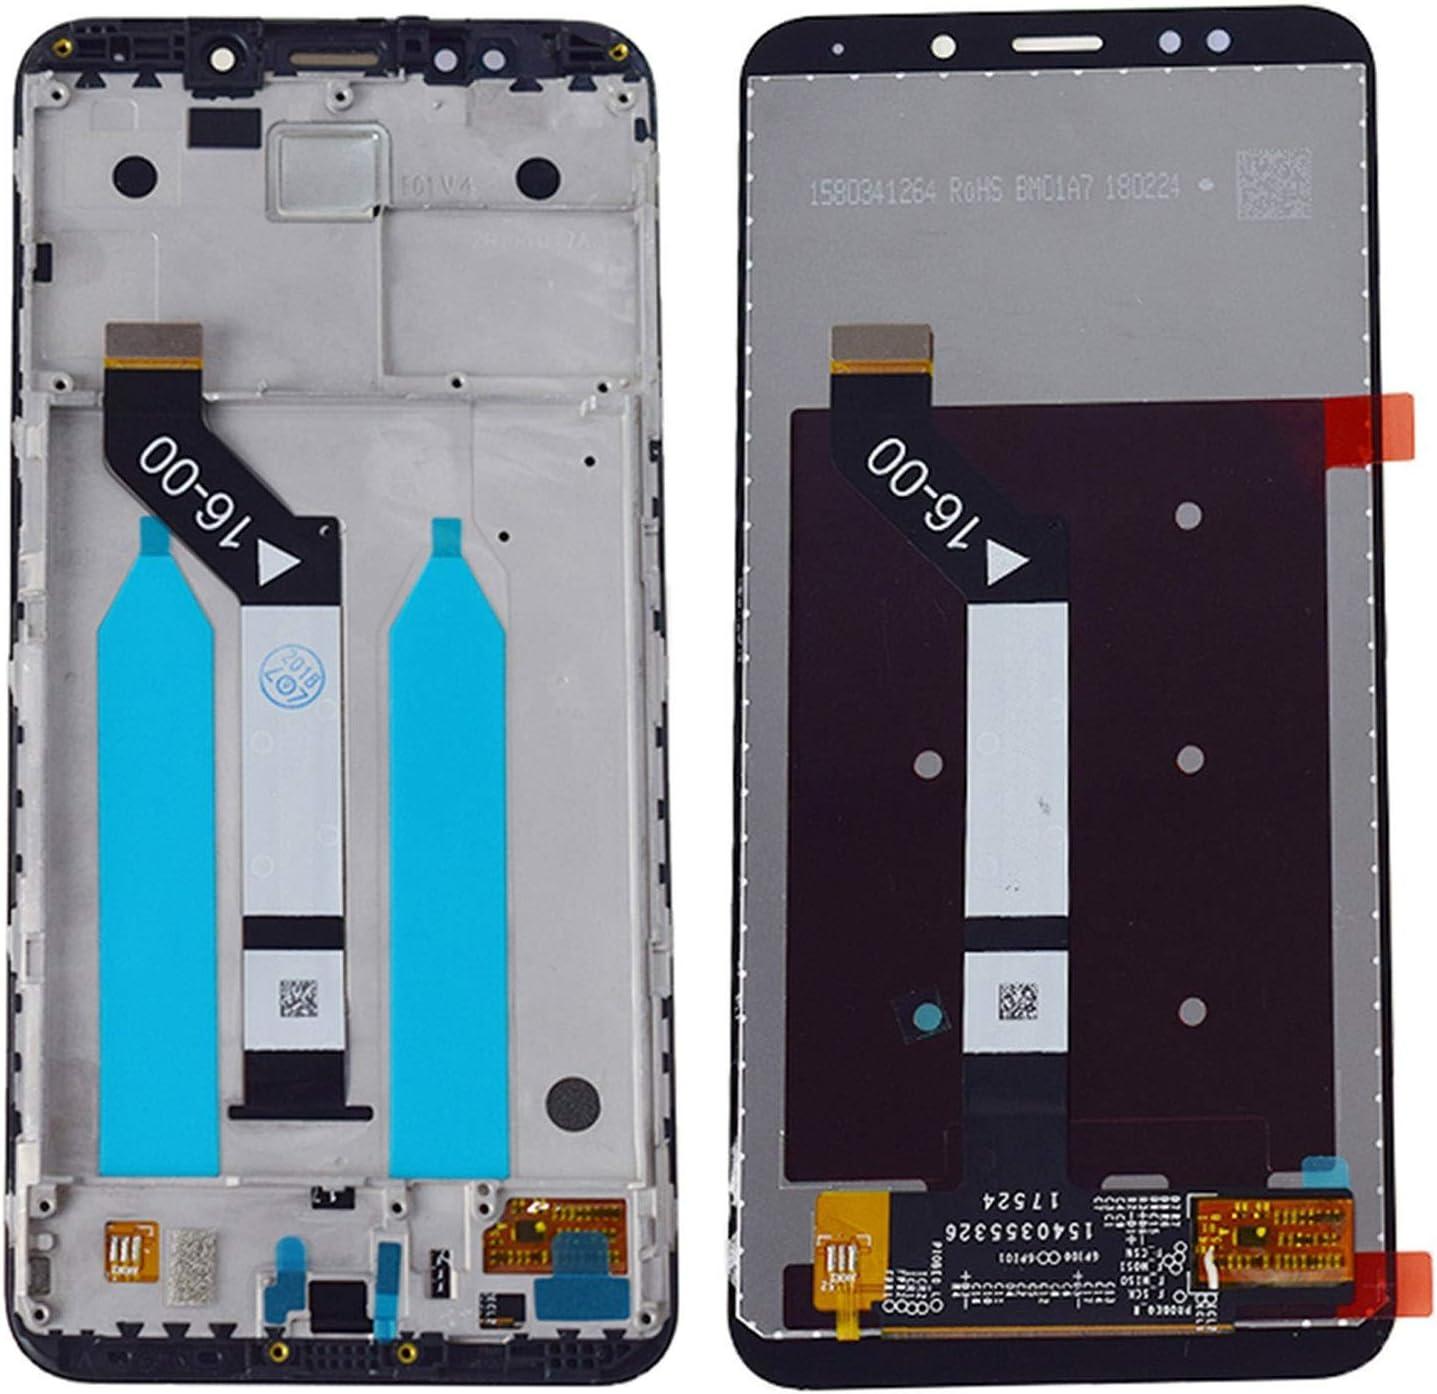 Ajuste para Fit For Xiaomi Redmi 5 Plus Pantalla LCD Pantalla Táctil Digitalizador del Sensor del Digitalizador Ajuste para Fit For Xiaomi Redmi 5PLUS LCD Touch Touch Frame 10 Touch